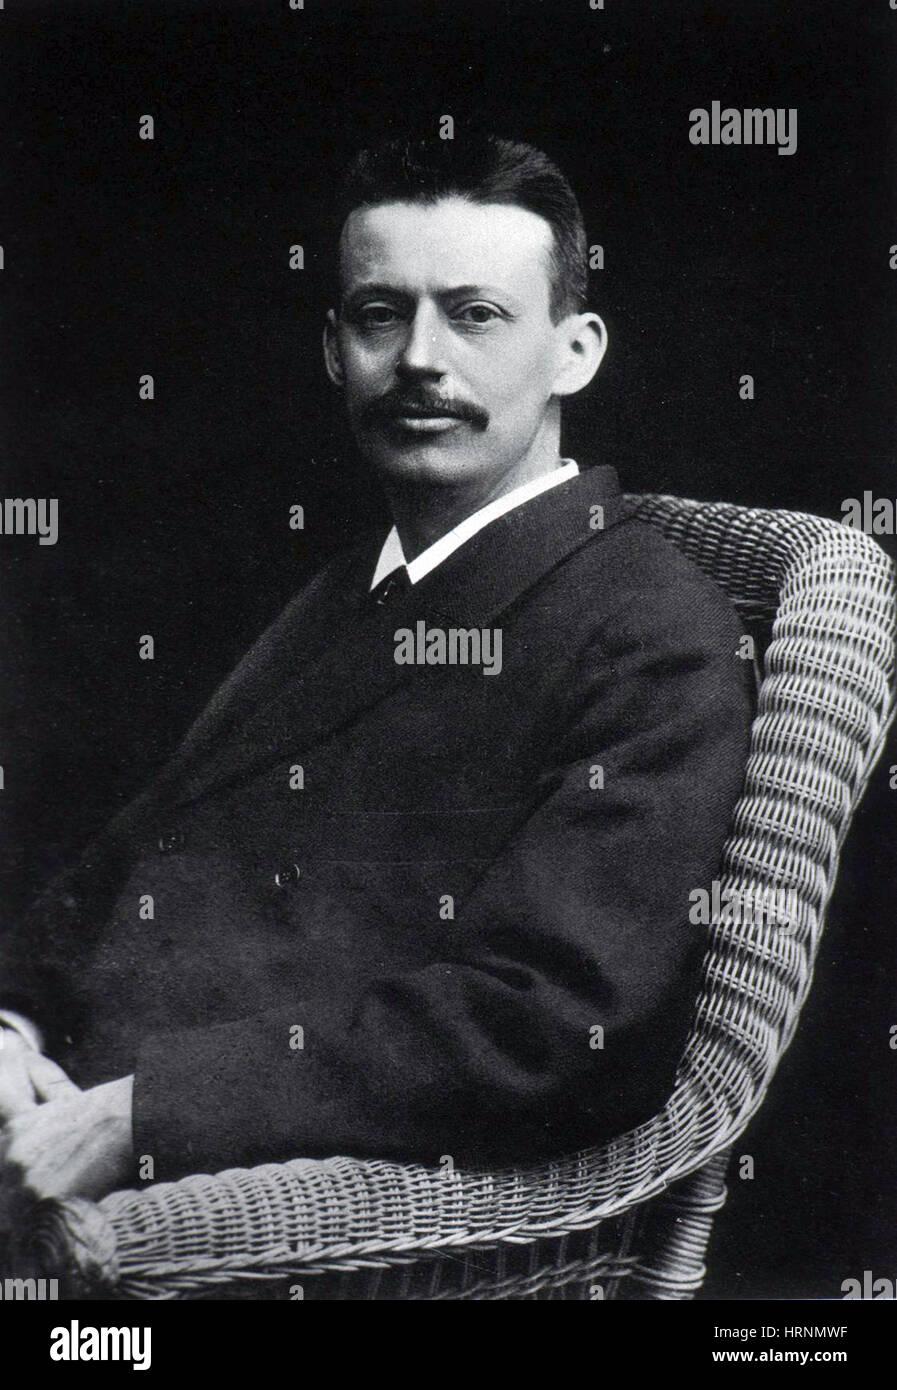 Niels Ryberg Finsen, Nobel Prize 1903 Stock Photo